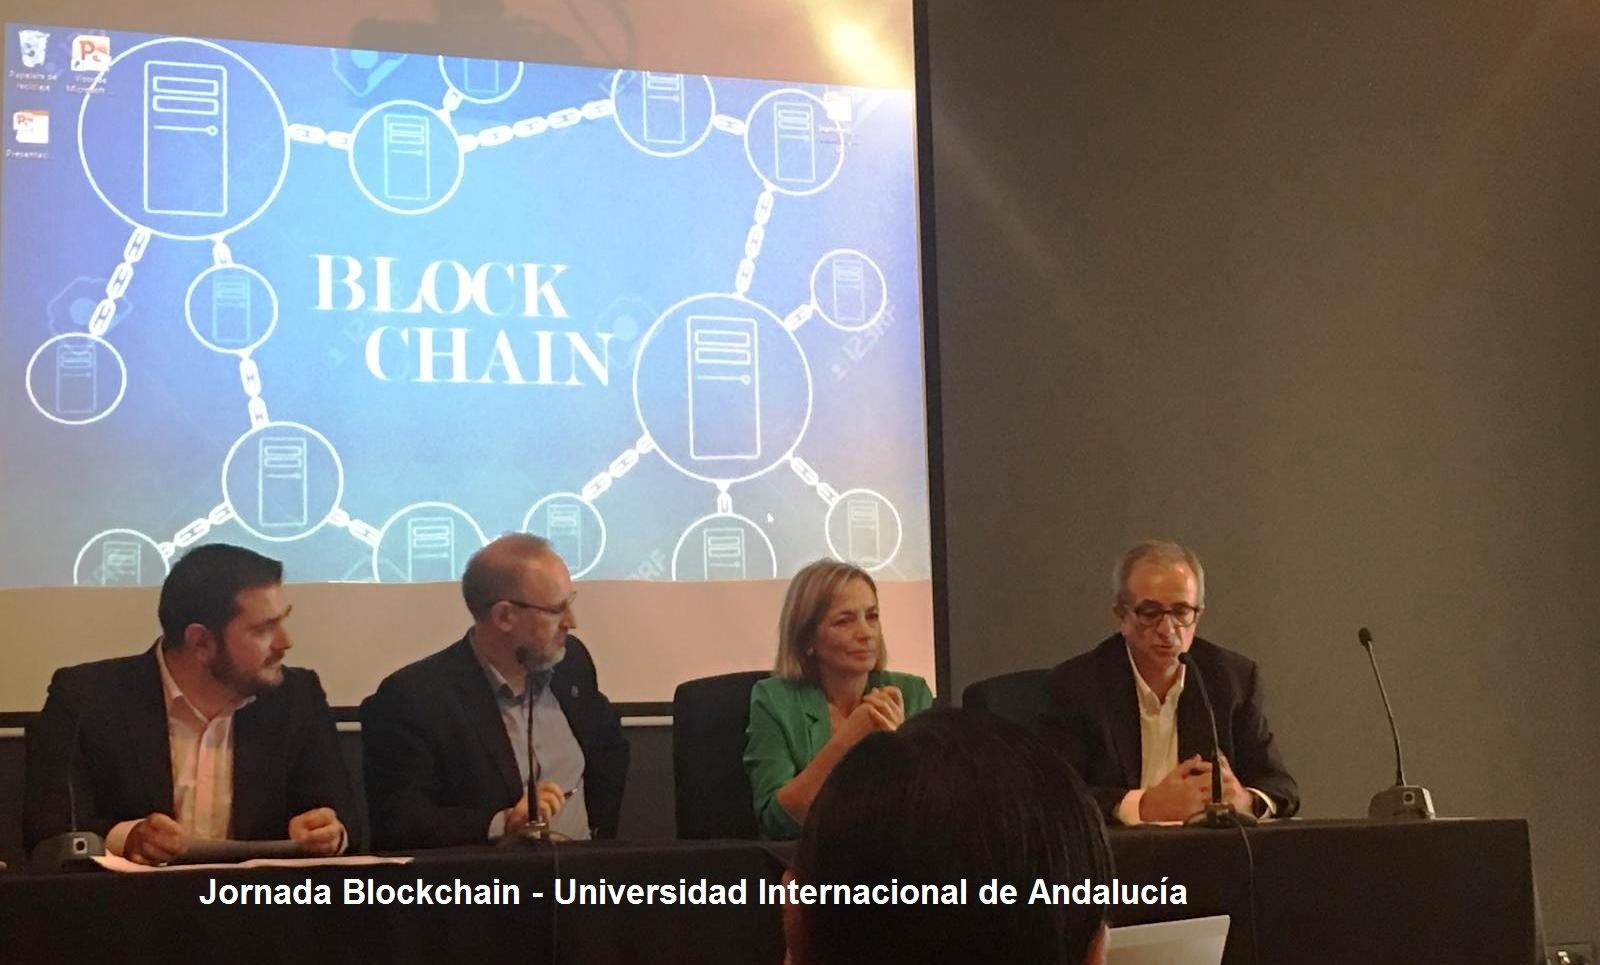 carlos-lopez-blockhain-10-2017-1